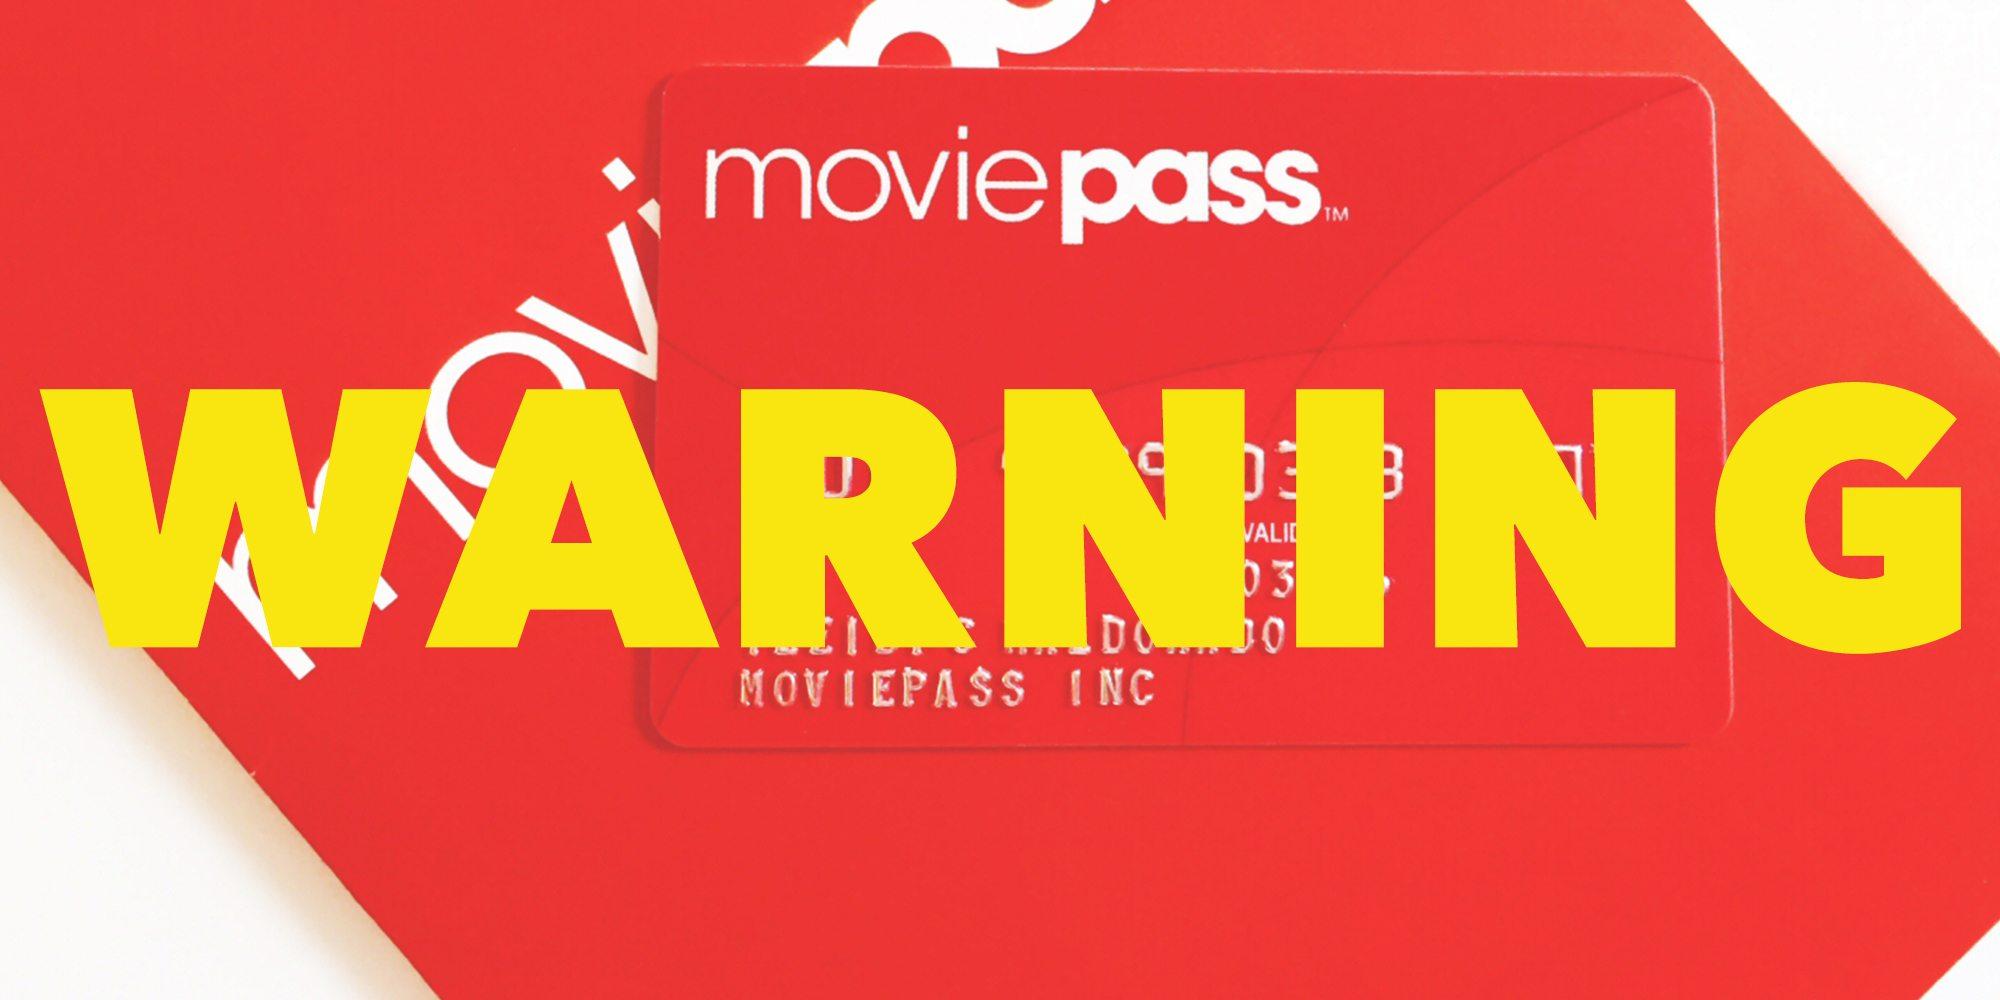 Buyer Beware: MoviePass Hidden Early Termination Fee